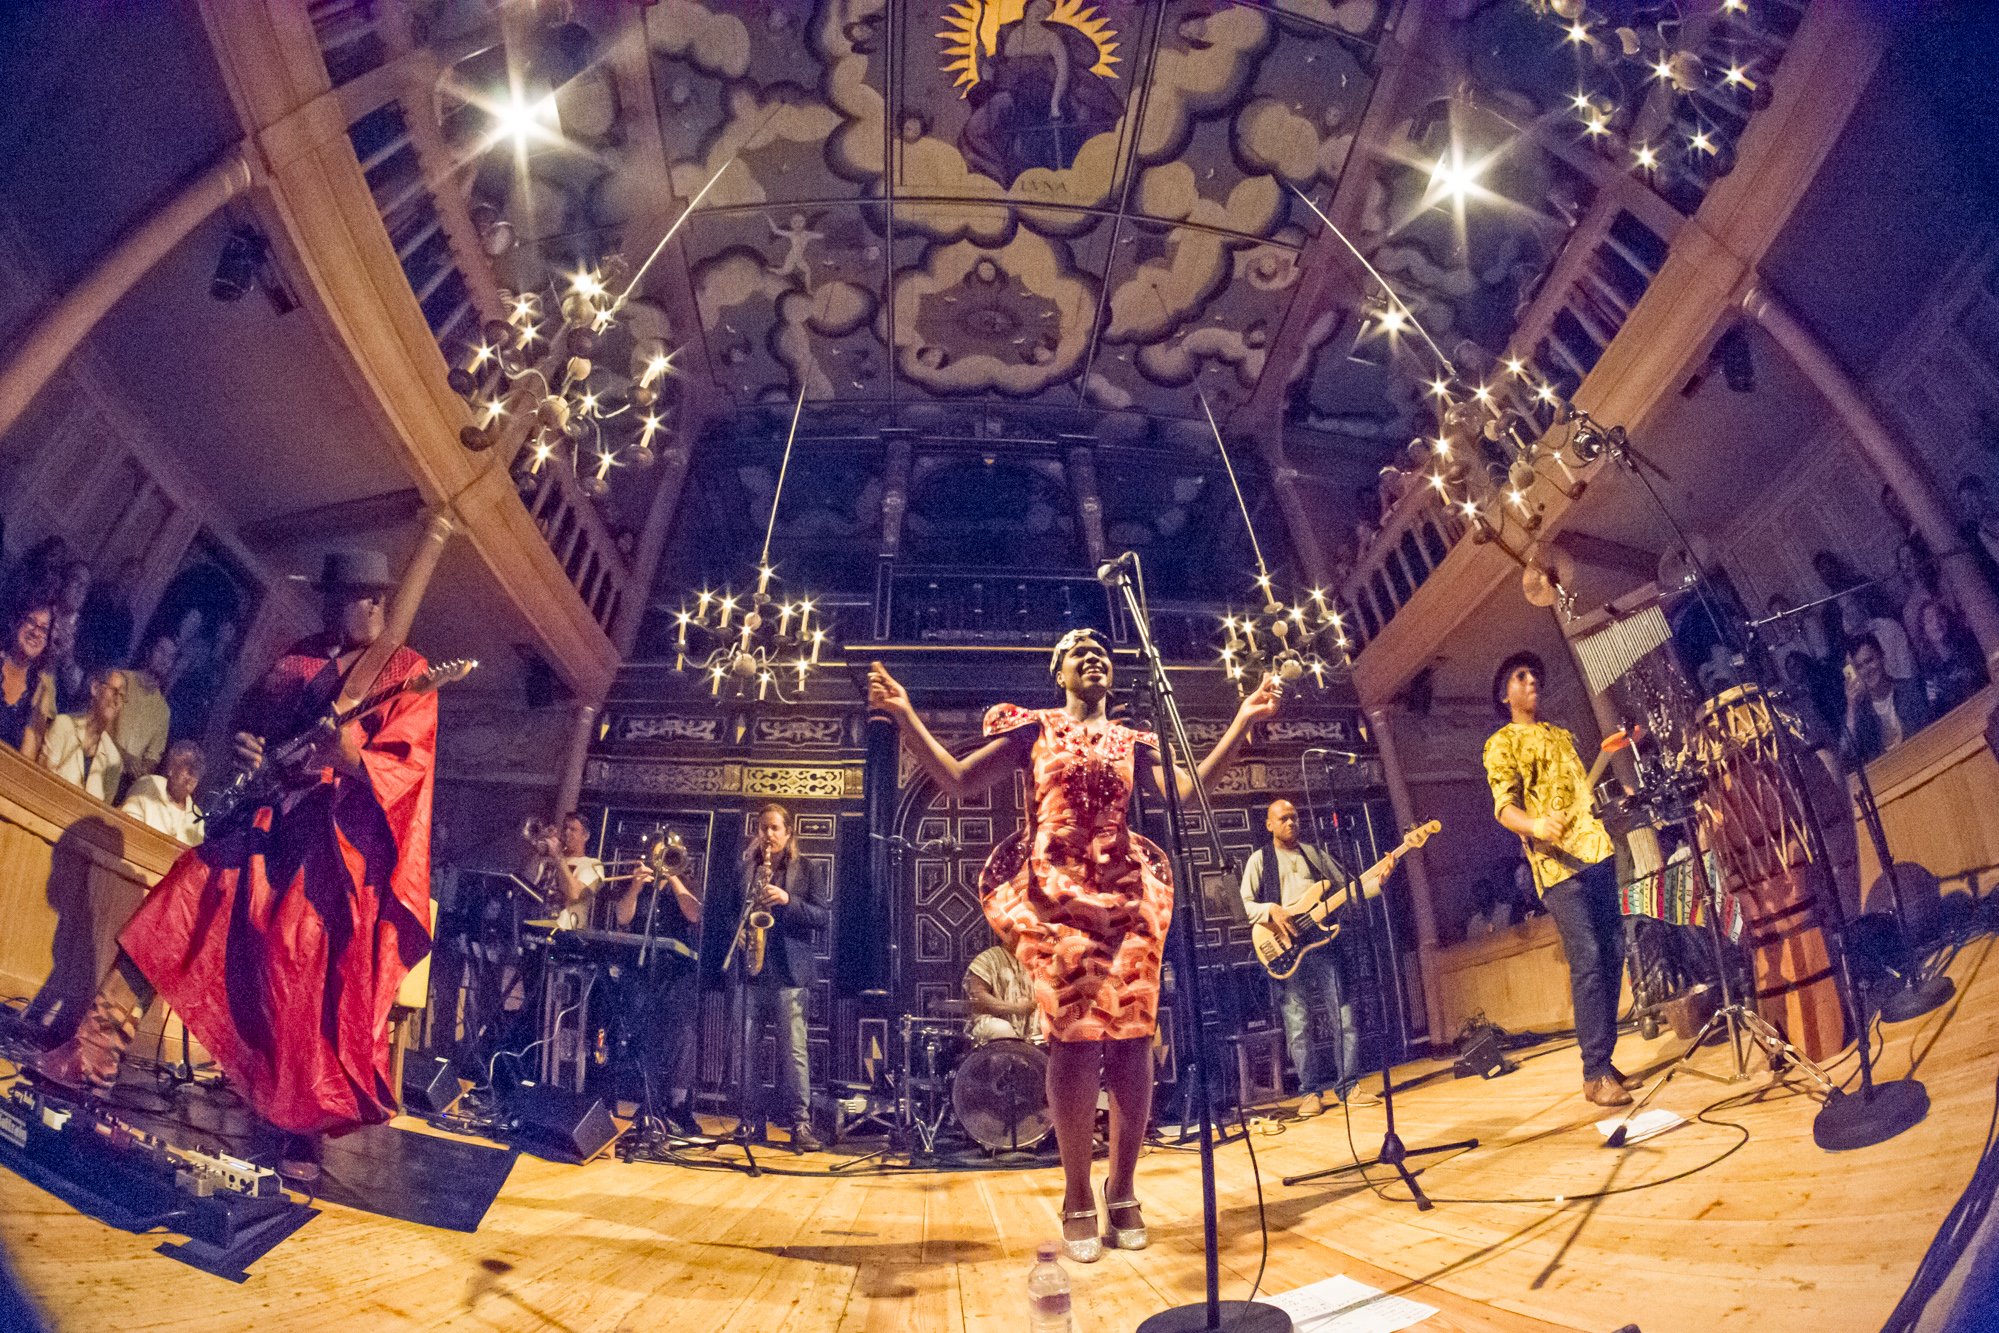 Ibibio Sound Machine photos at The Globe